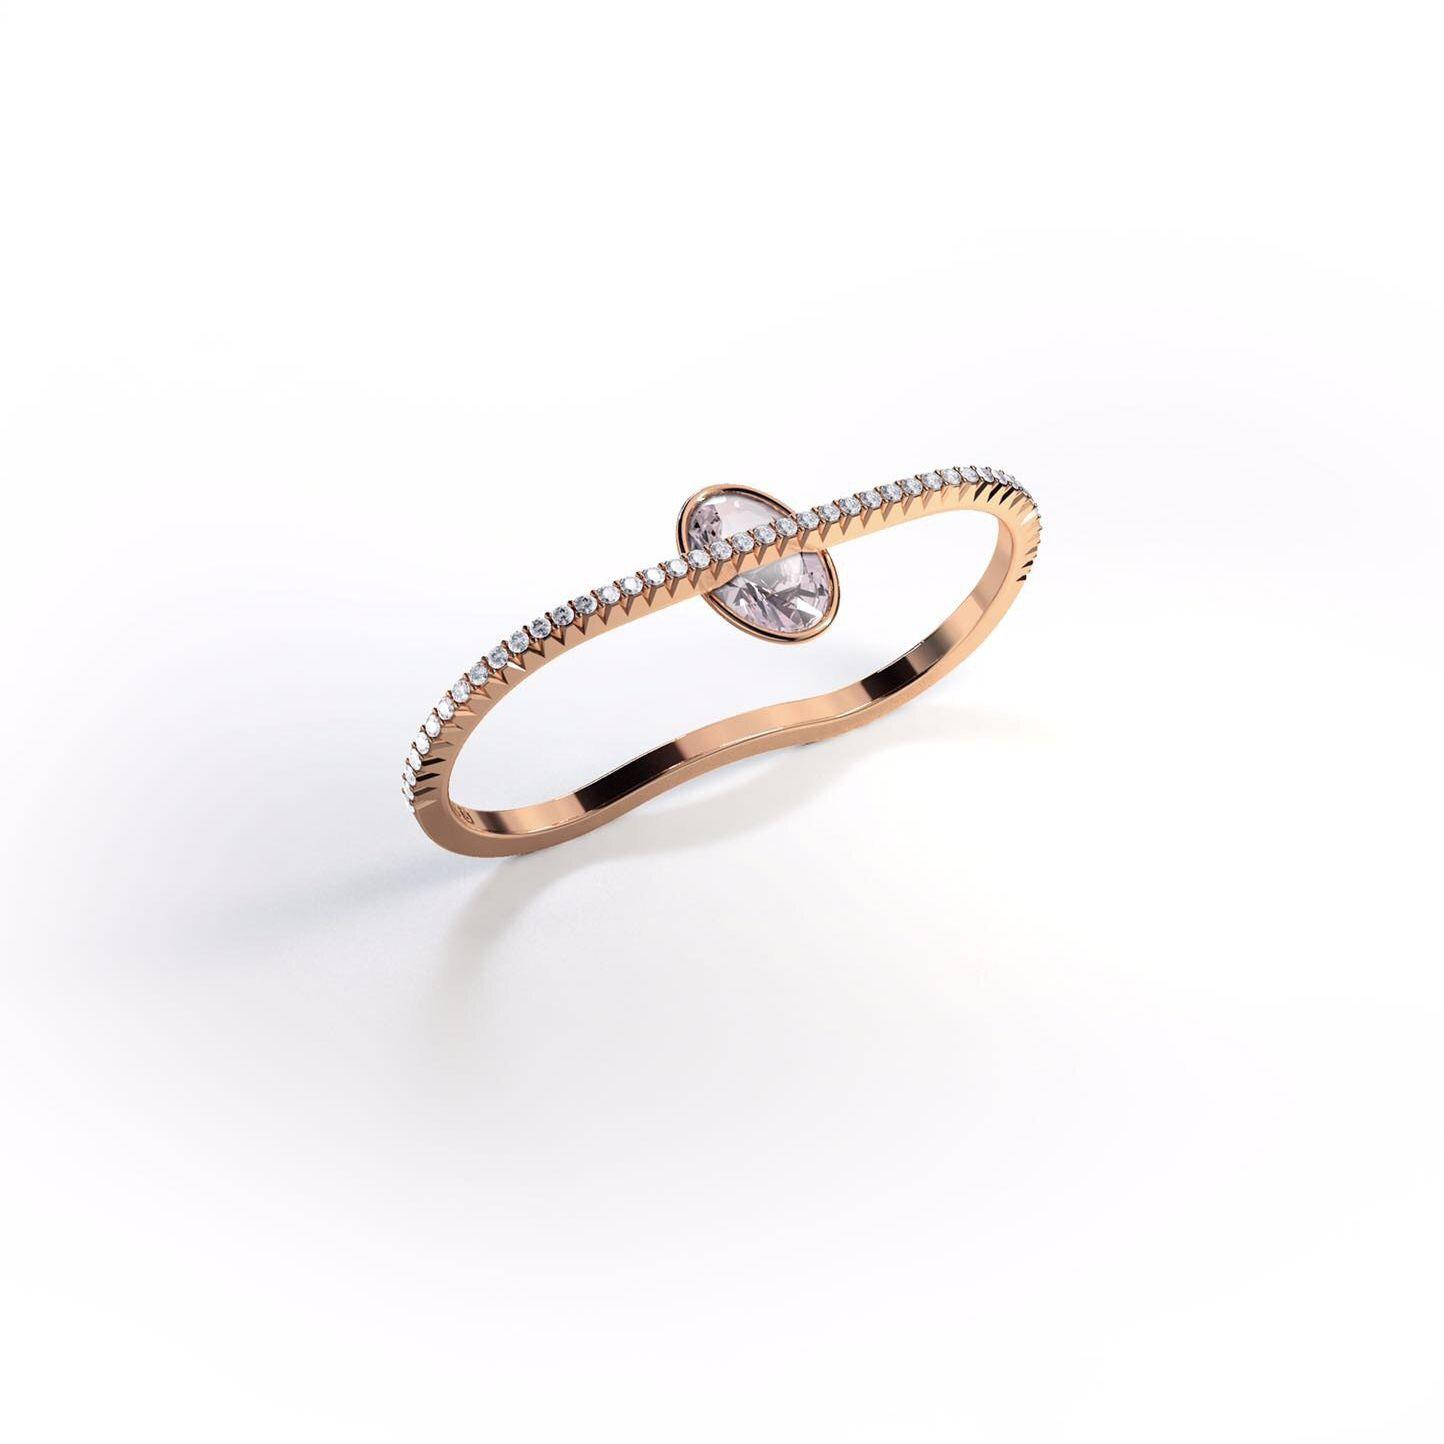 Jessie V E Femme Fatale 'Enchantress' Ring